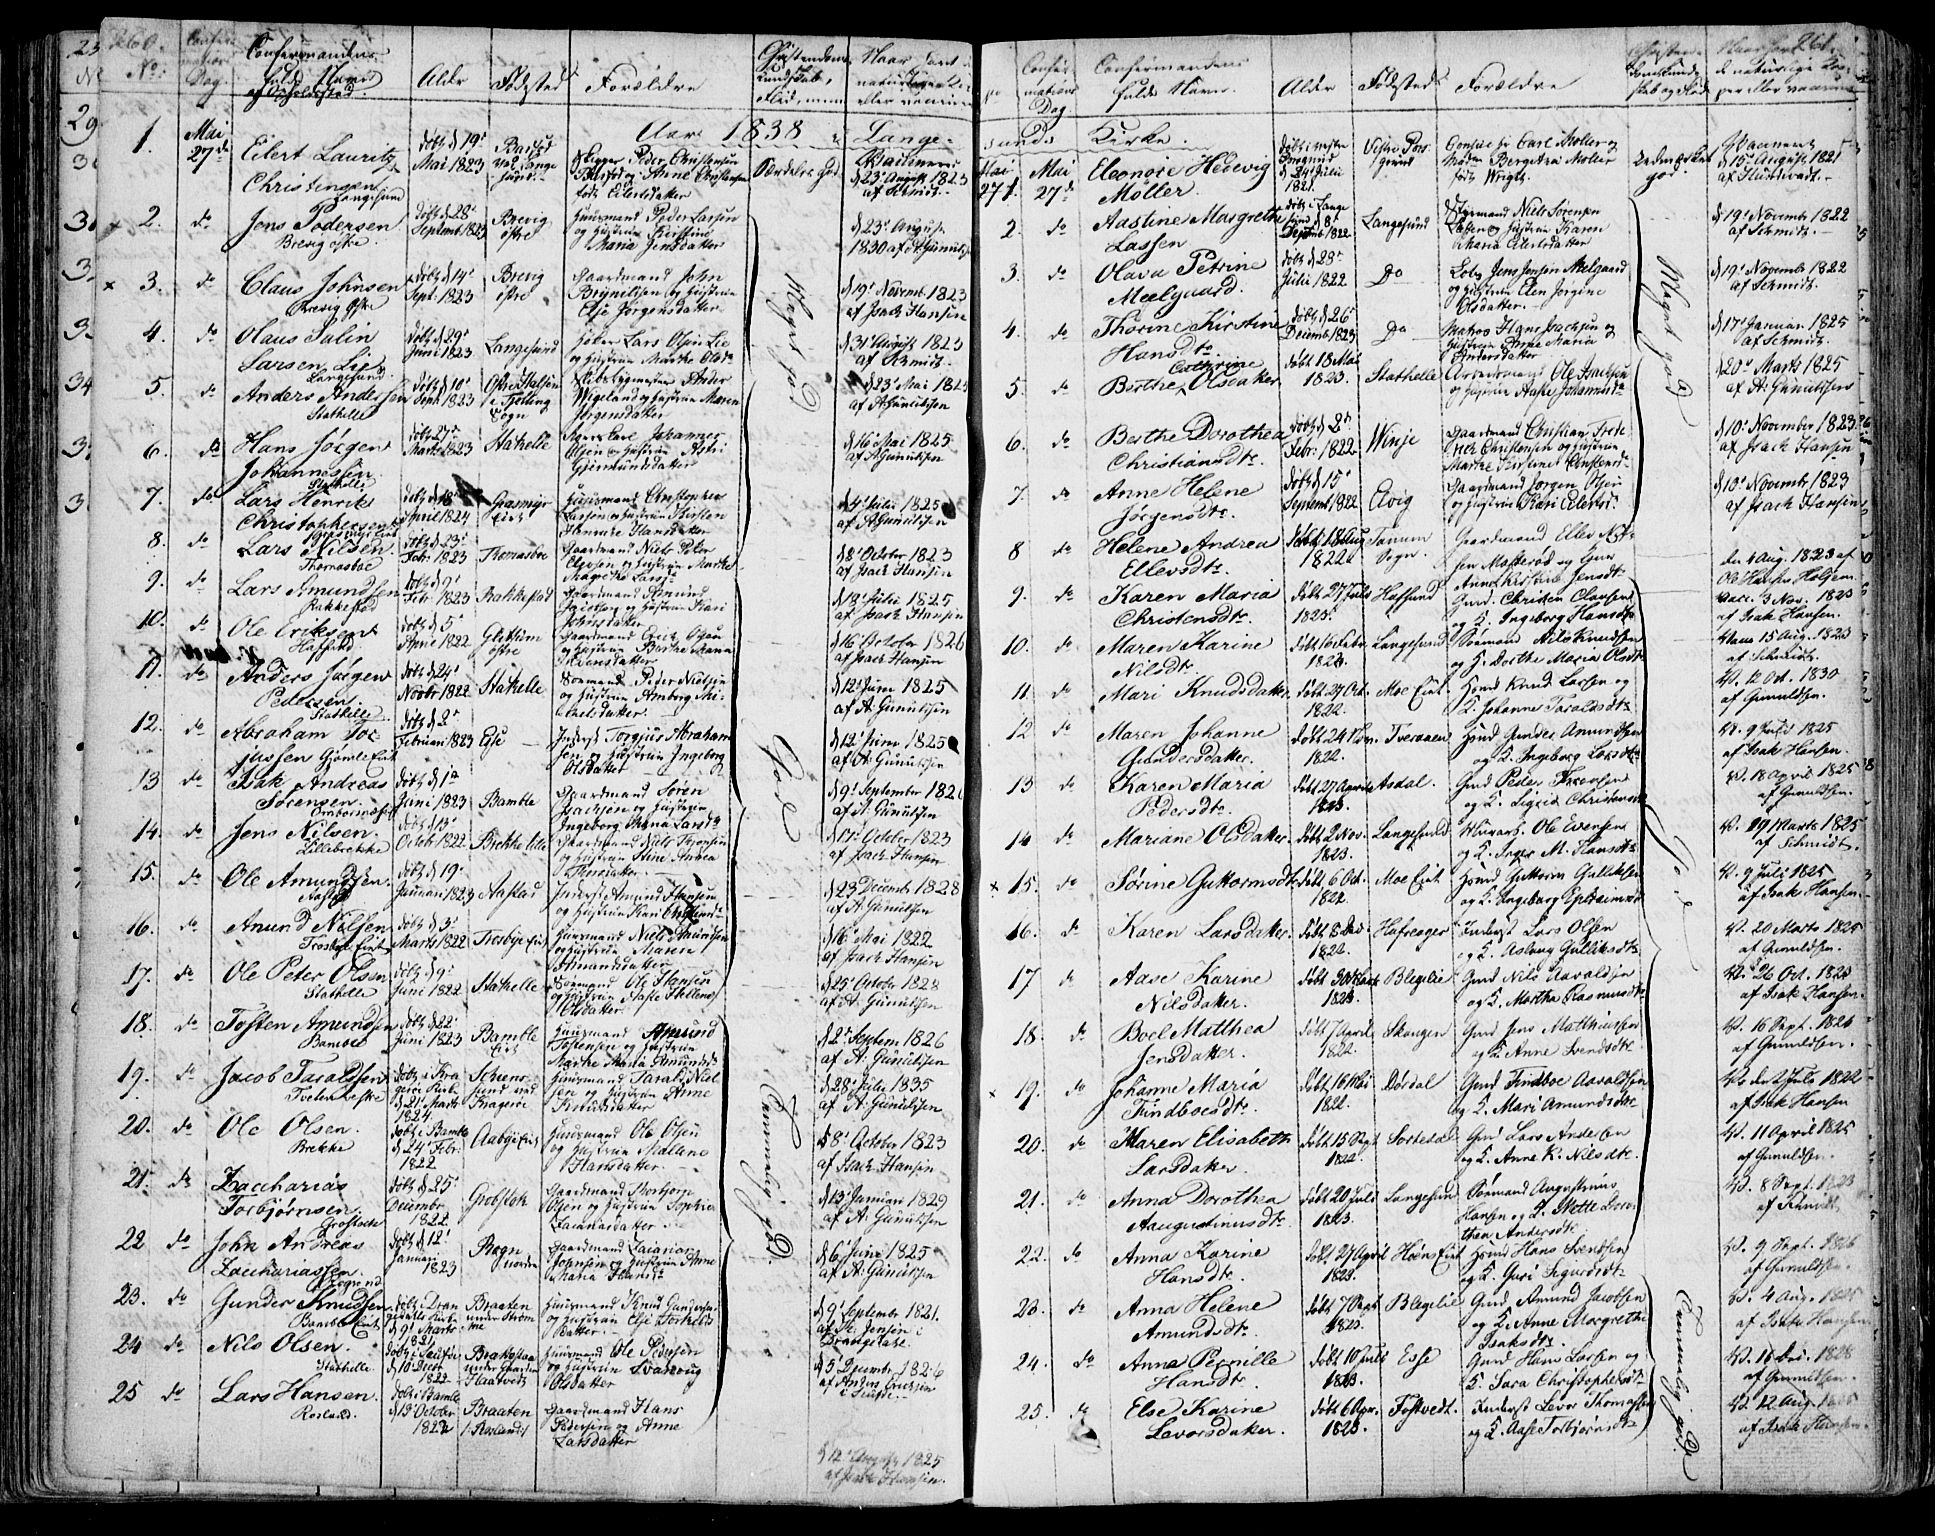 SAKO, Bamble kirkebøker, F/Fa/L0004: Ministerialbok nr. I 4, 1834-1853, s. 260-261